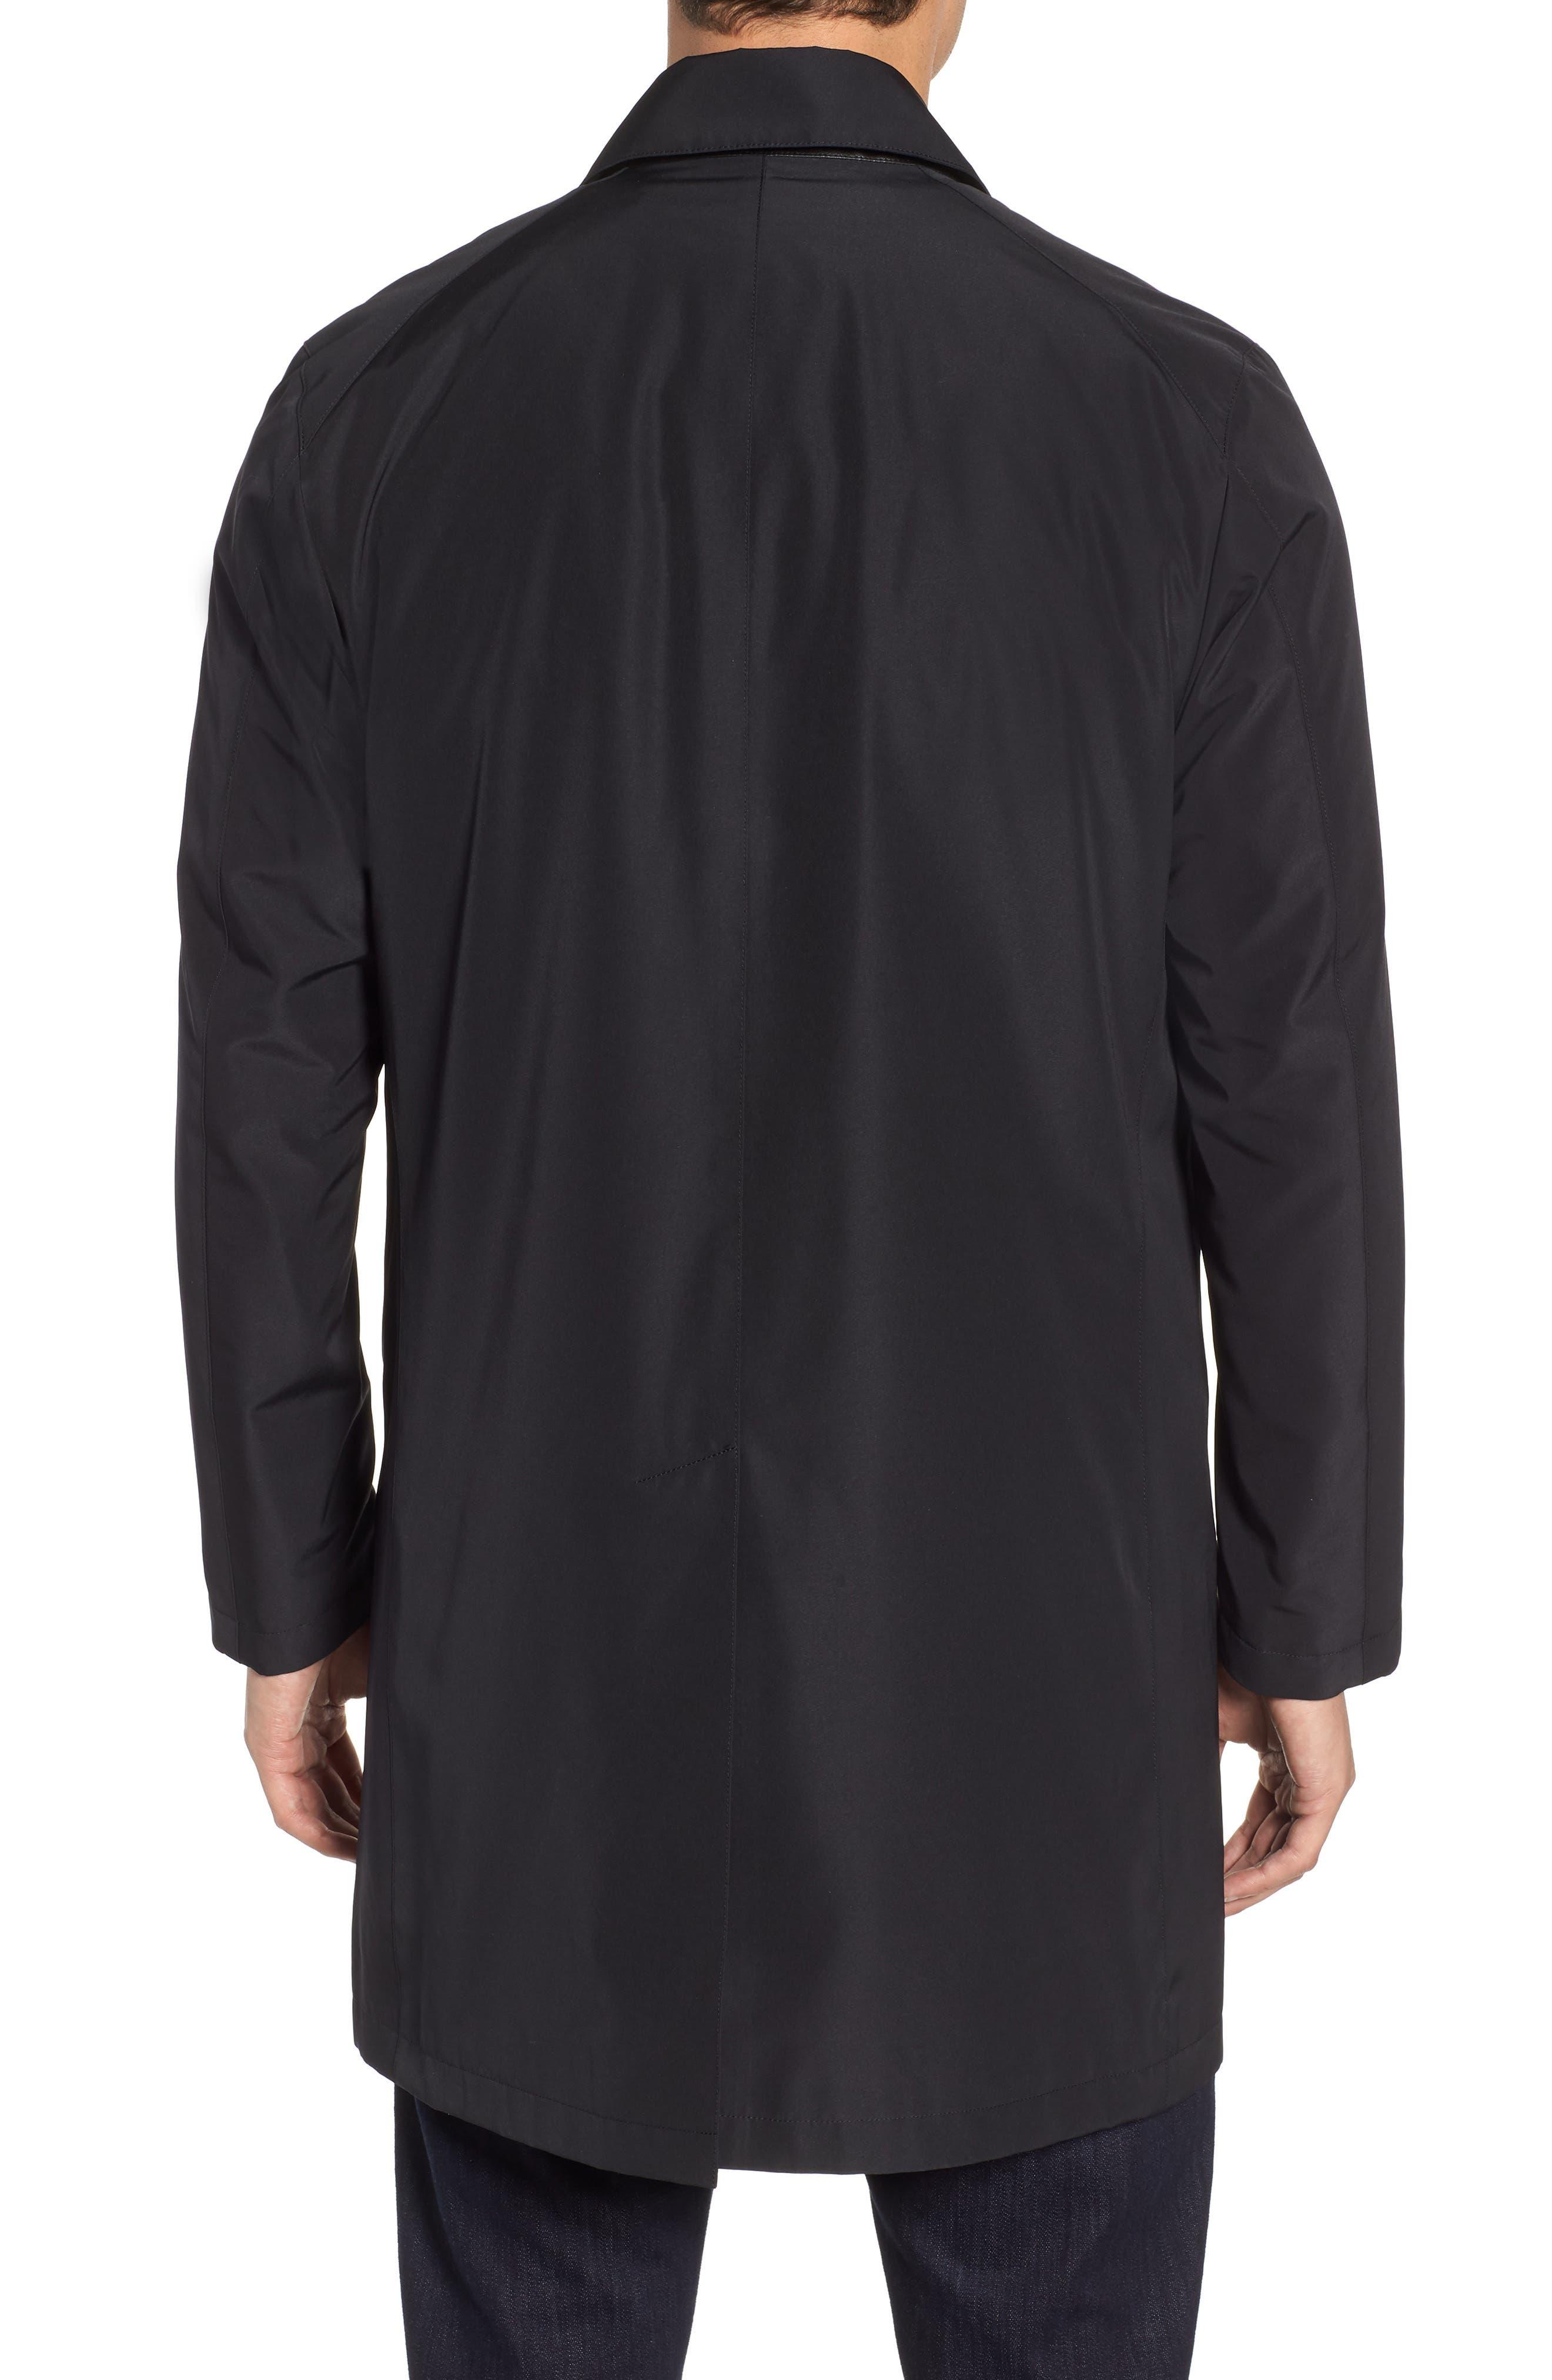 Ducasse Raincoat,                             Alternate thumbnail 2, color,                             BLACK